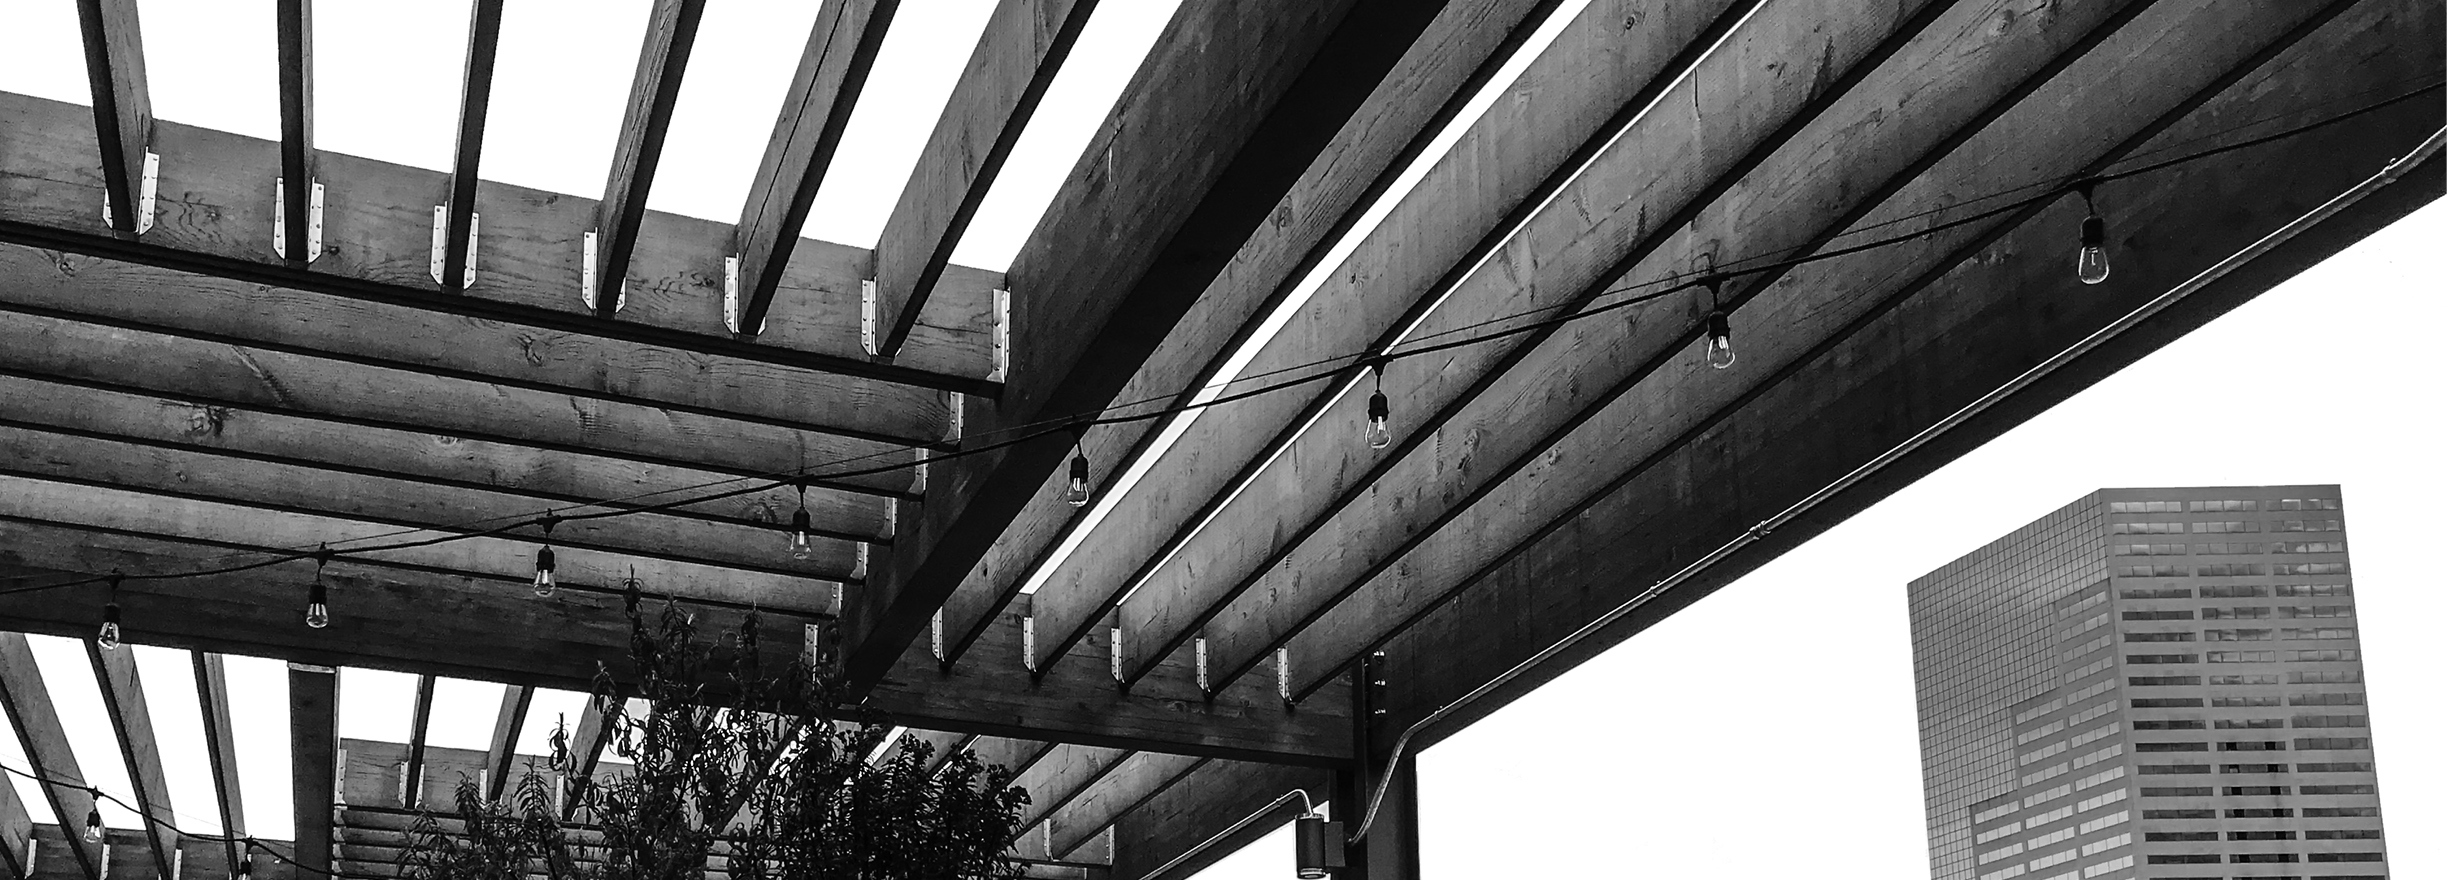 ConcertPageBanner_Rooftops.jpg